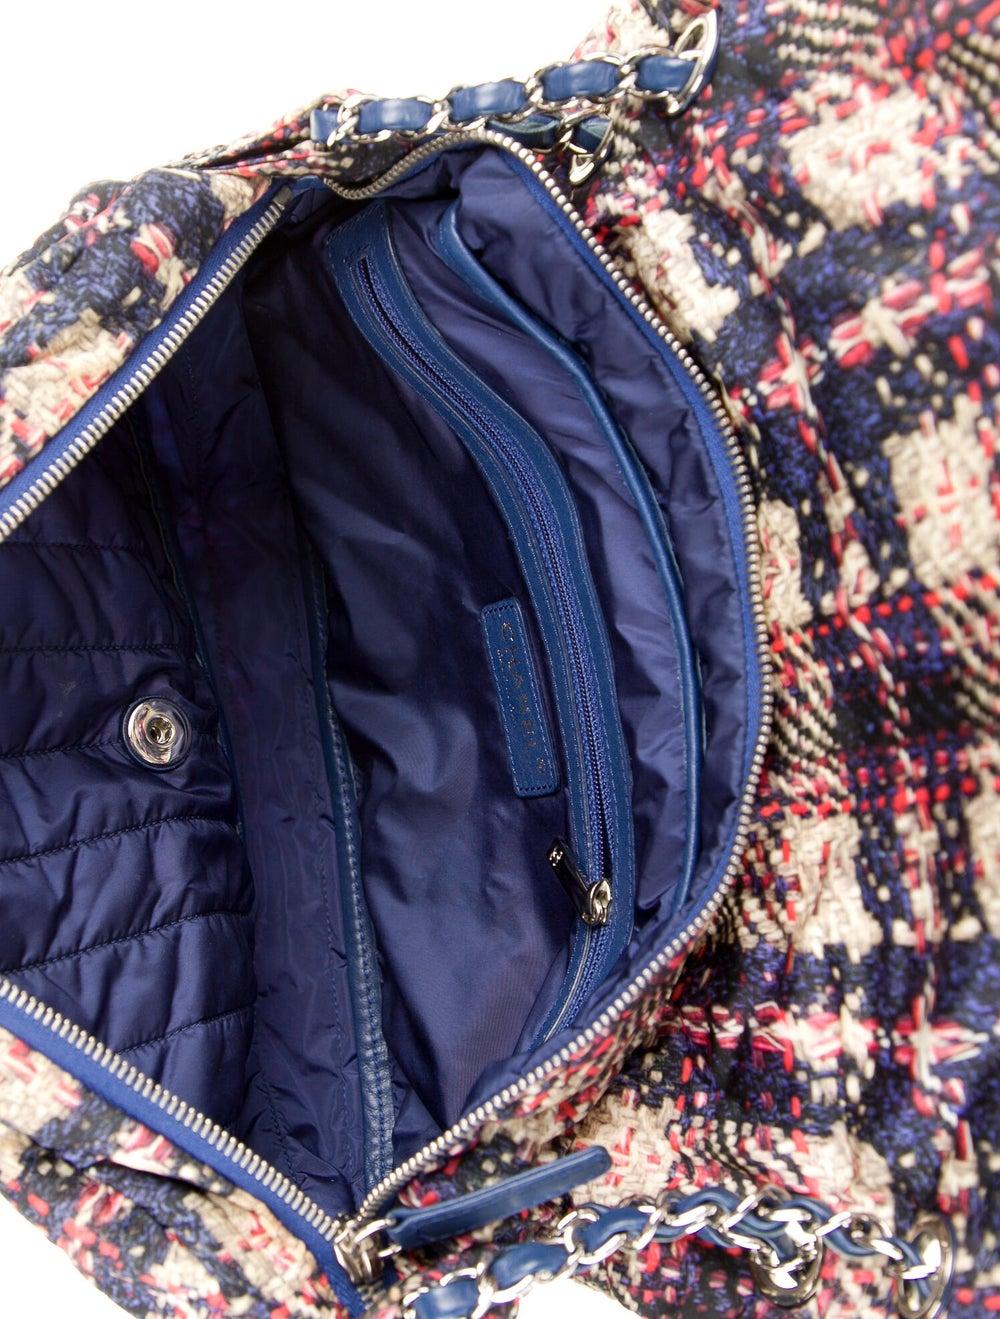 Chanel Medium Nylon Tweed Flap Bag Blue - image 5